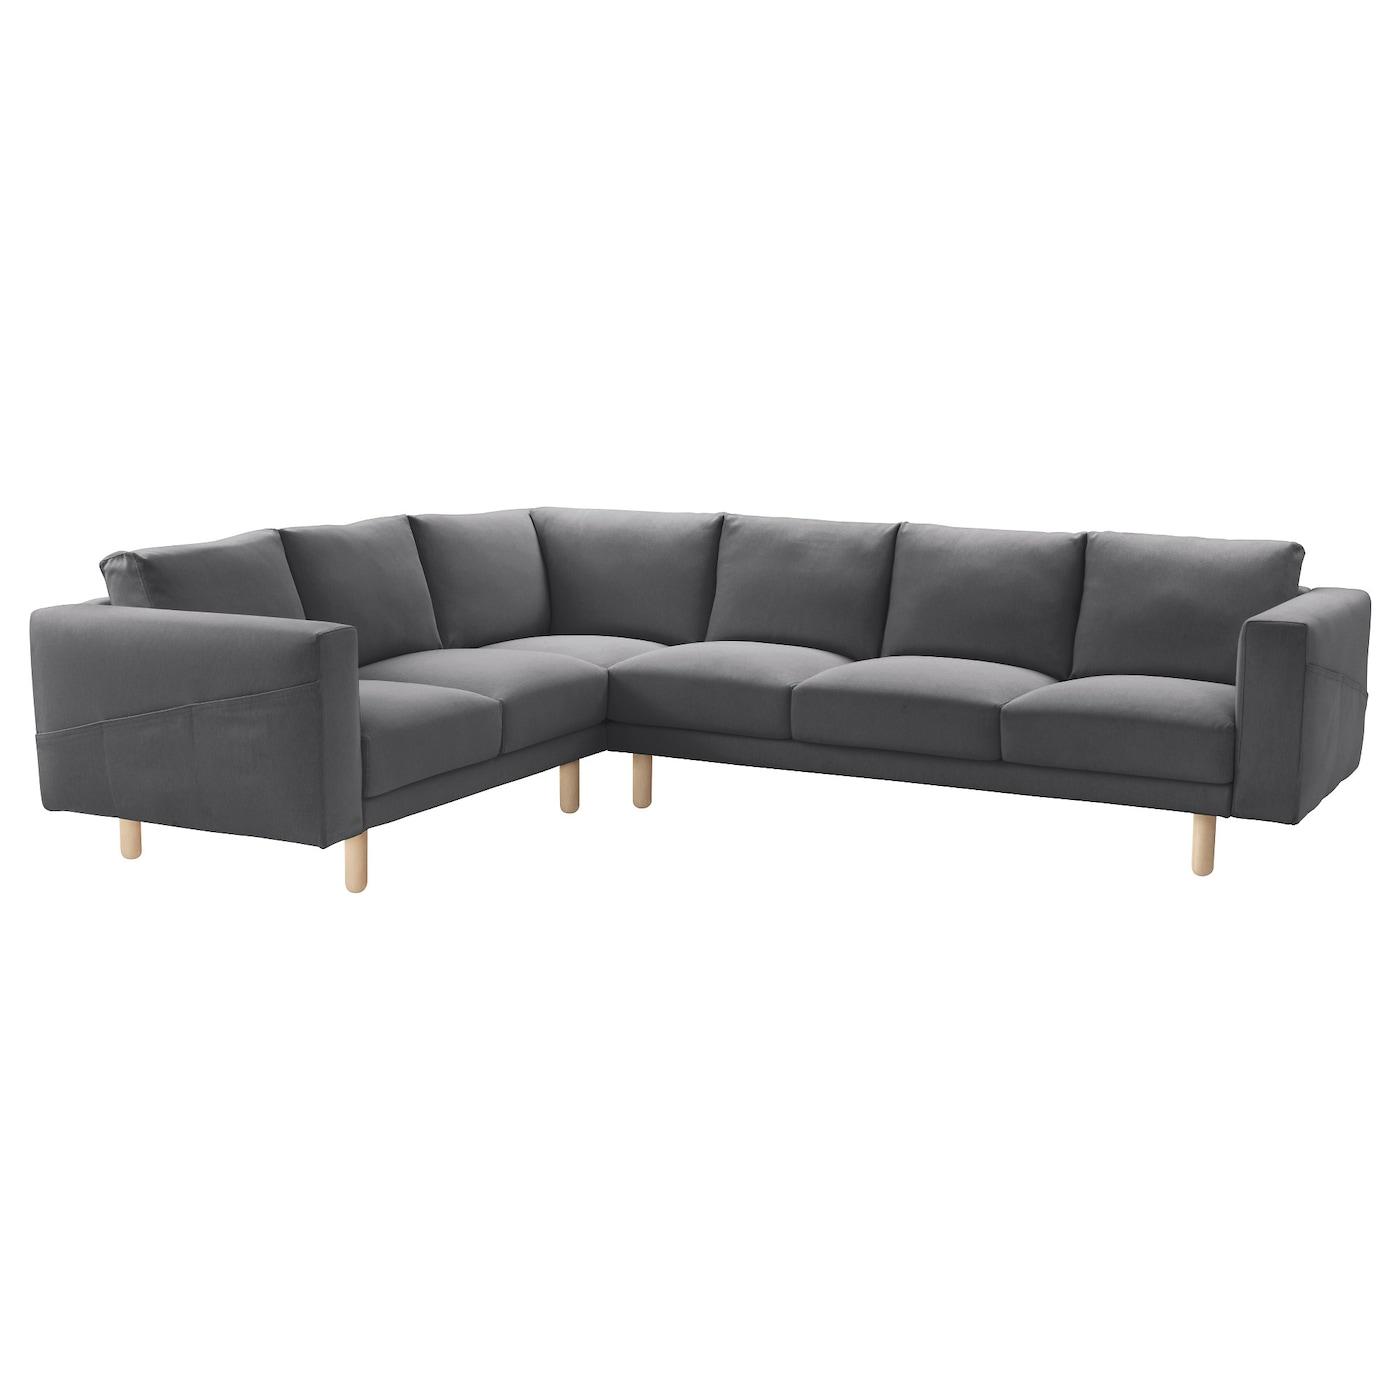 NORSBORG Corner sofa 5 seat Finnsta dark grey birch IKEA